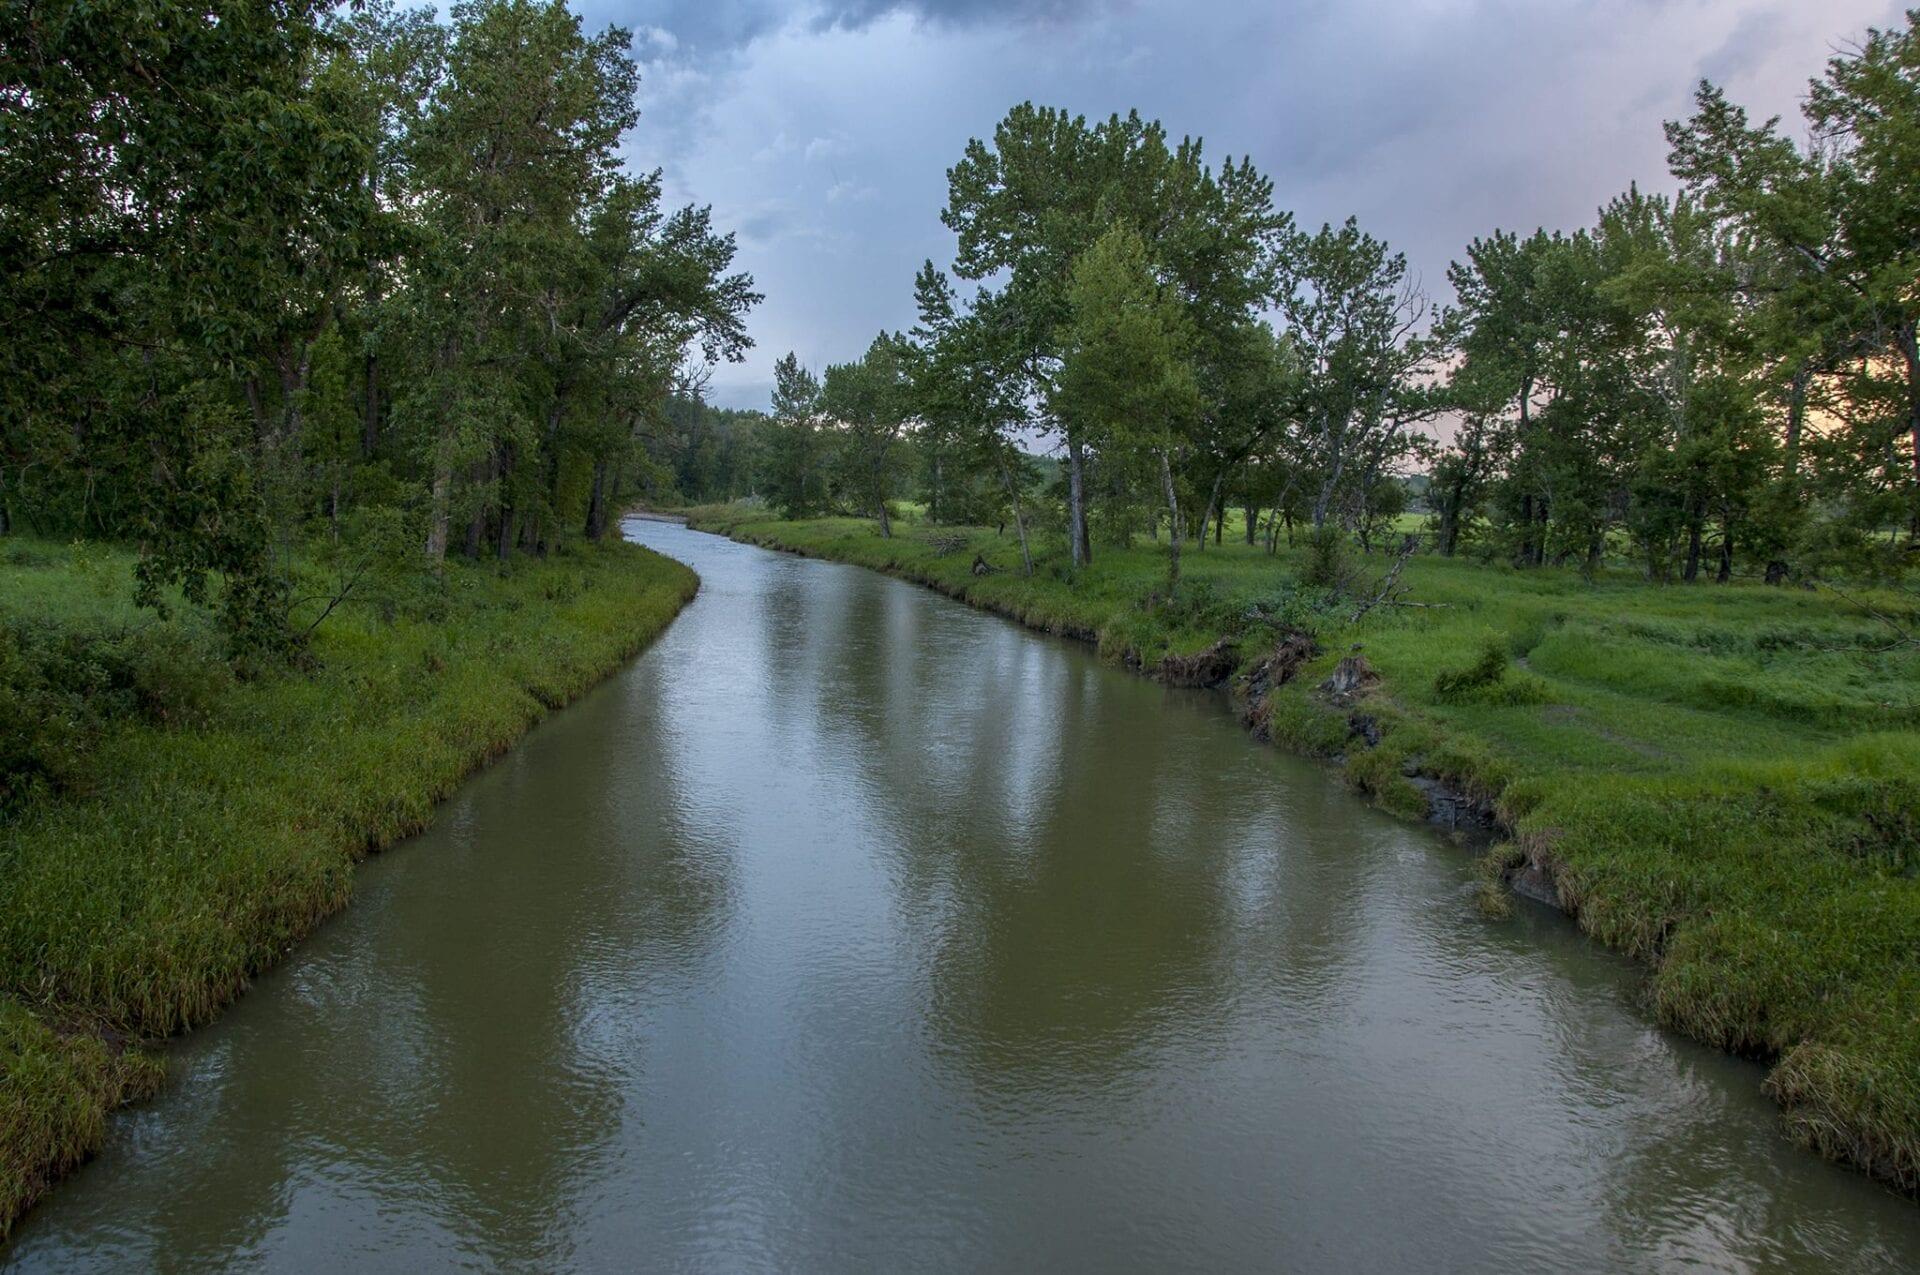 calgary-flood fishcreek- fish creek (17)